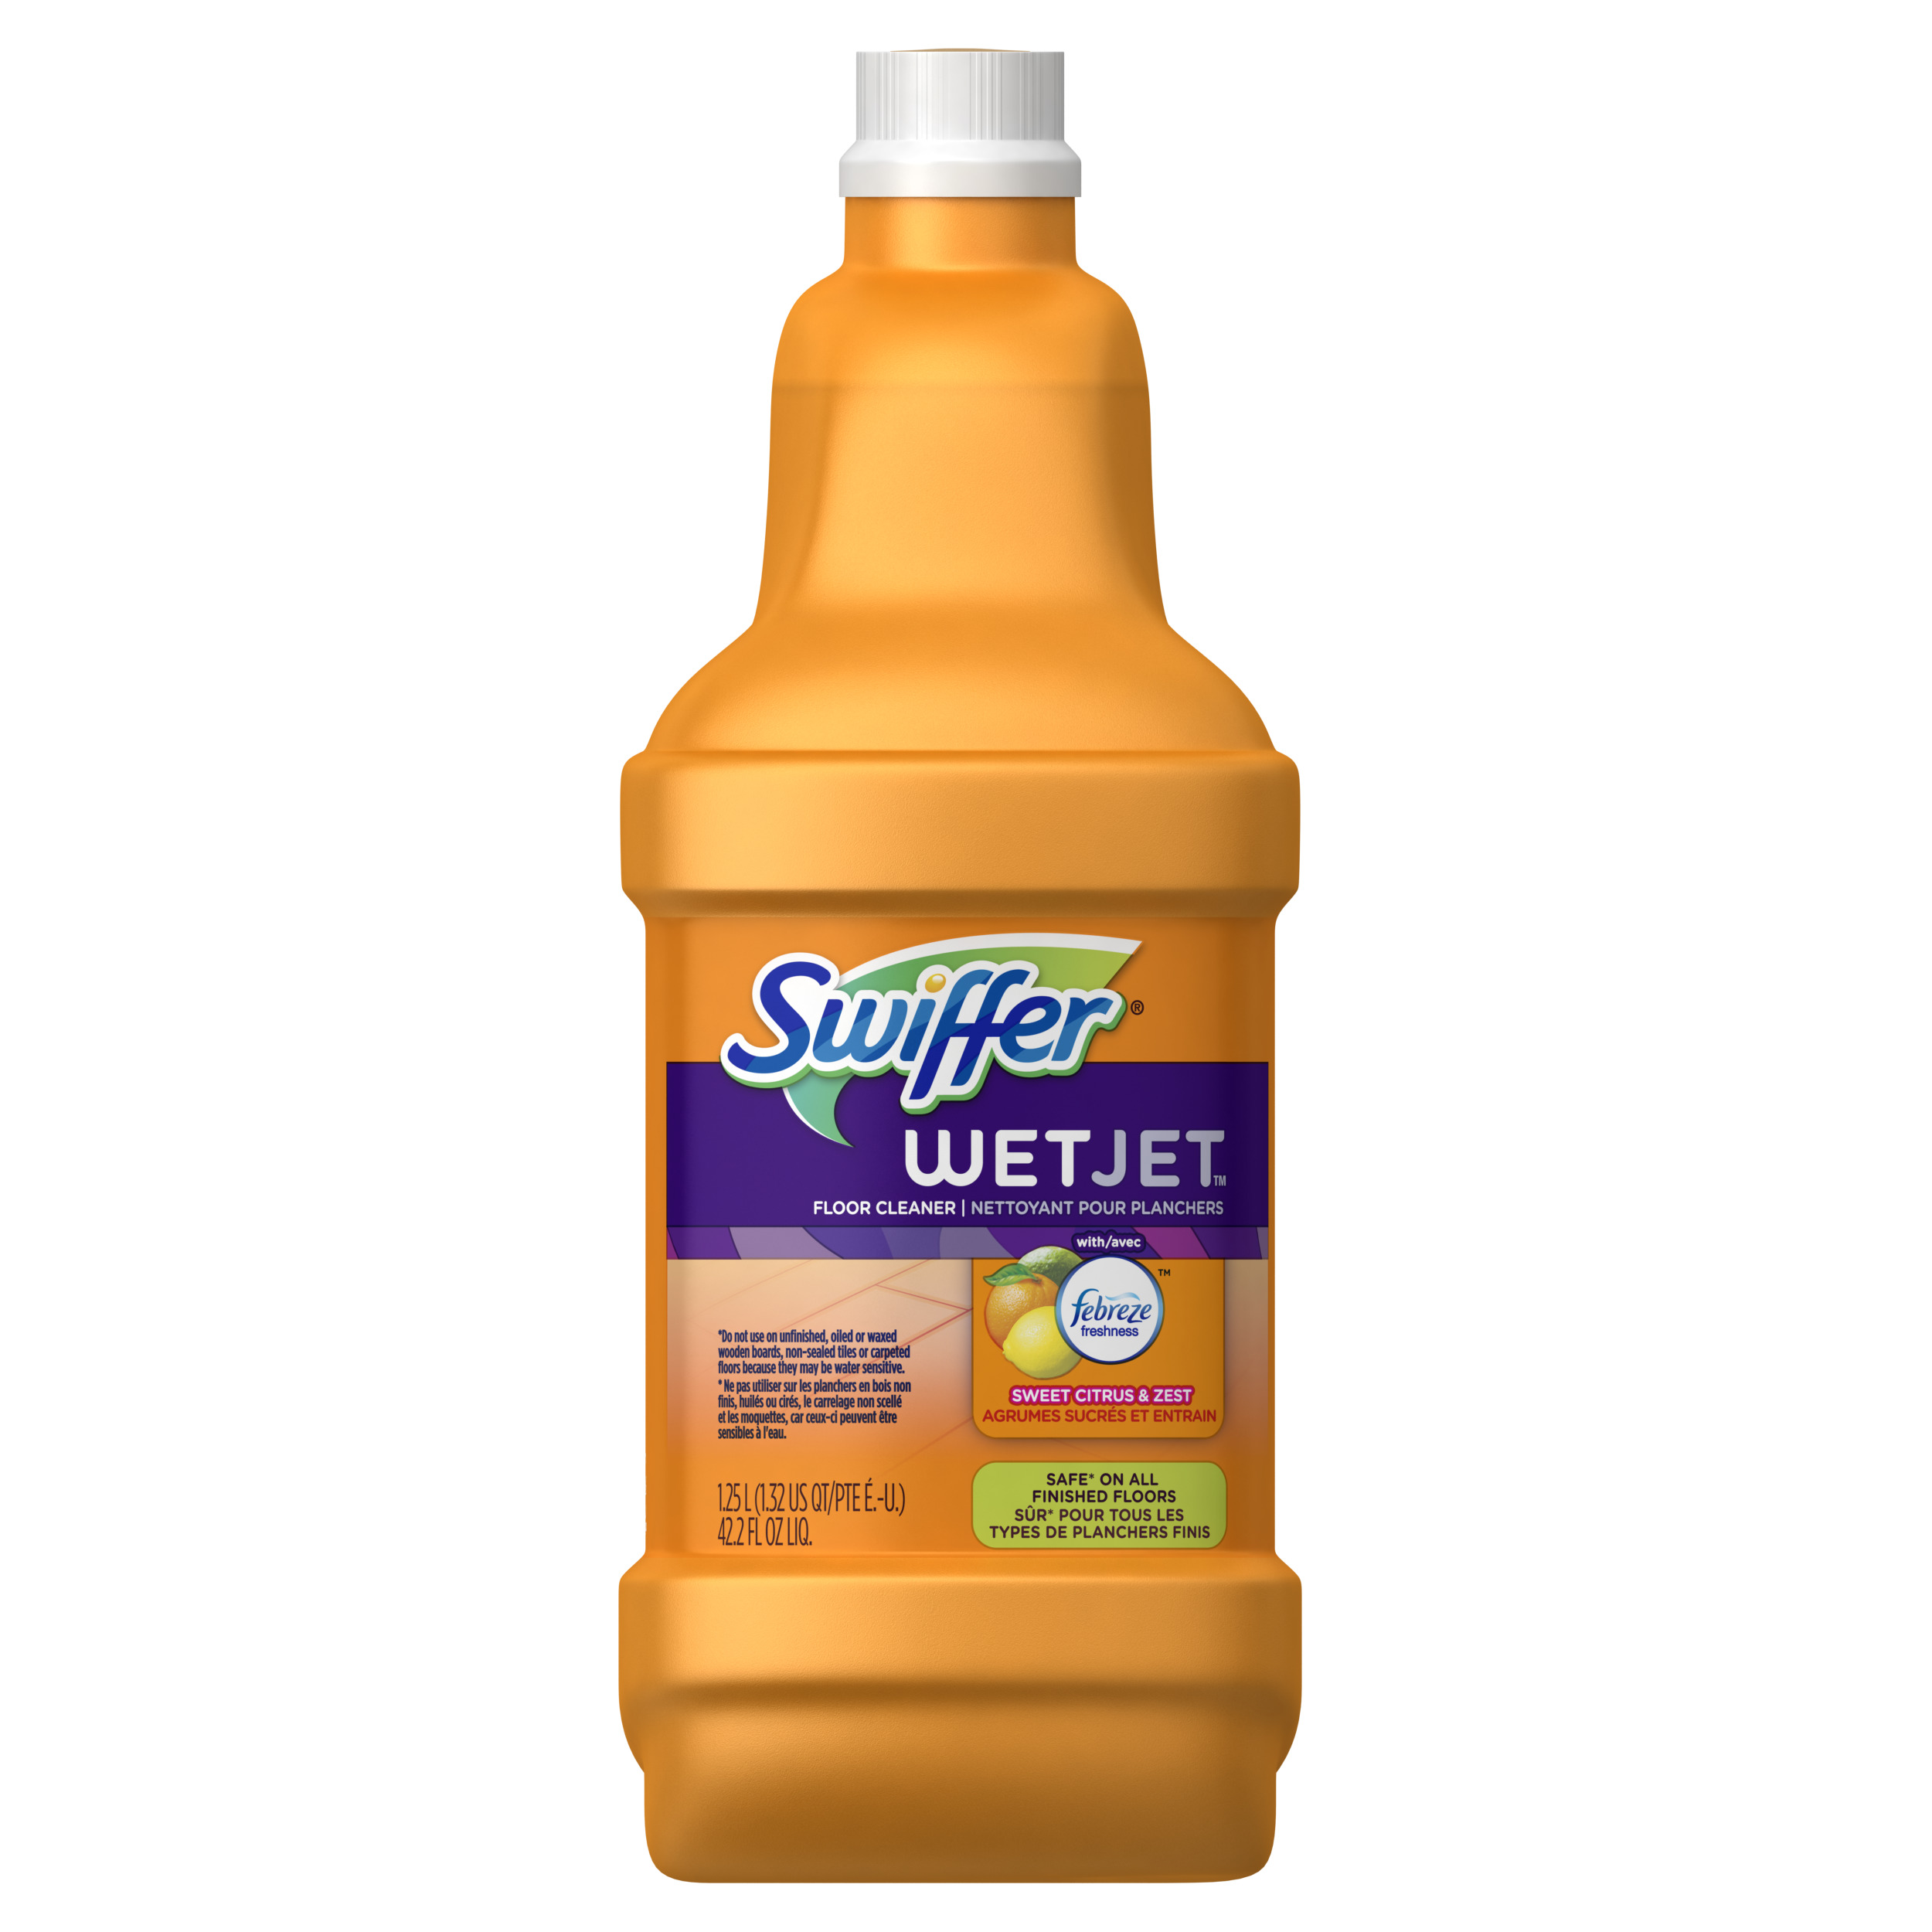 Swiffer WetJet Multi-Purpose Floor and Hardwood Liquid Cleaner Solution Refill, with Febreze Sweet Citrus & Zest, 42.2 fl oz